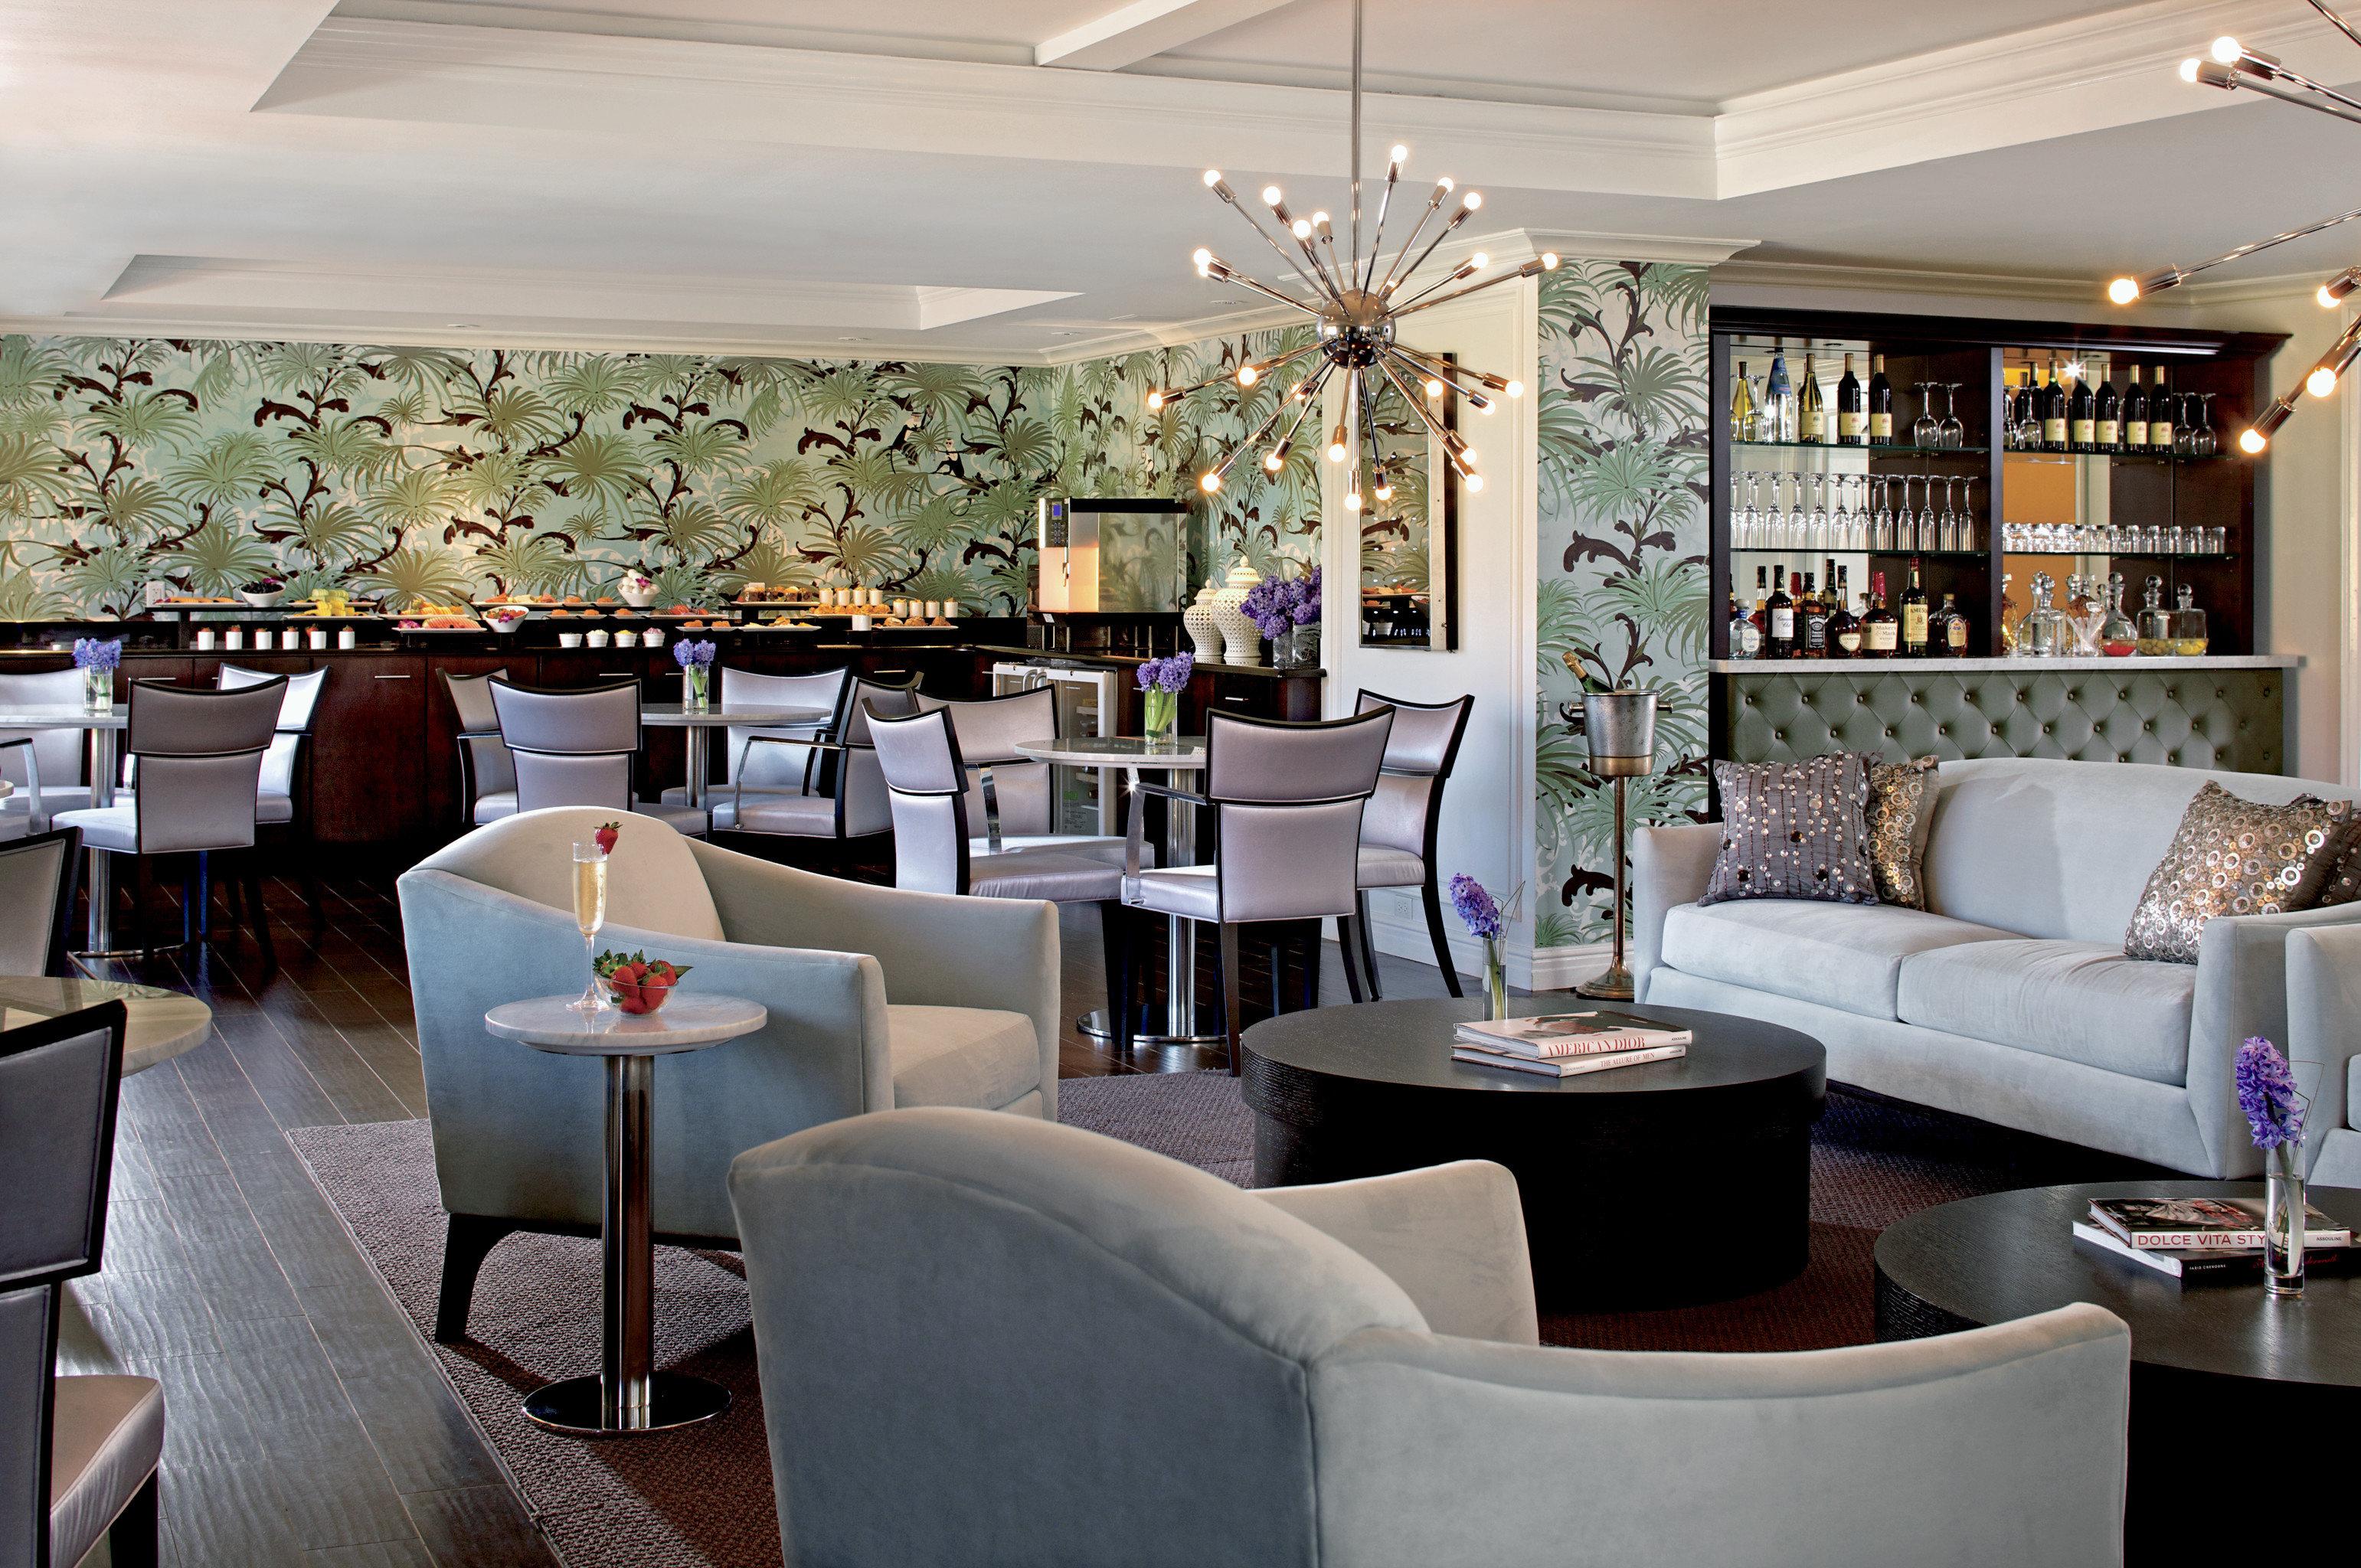 Dining Drink Eat Modern Resort chair property restaurant living room home condominium Lobby Bar